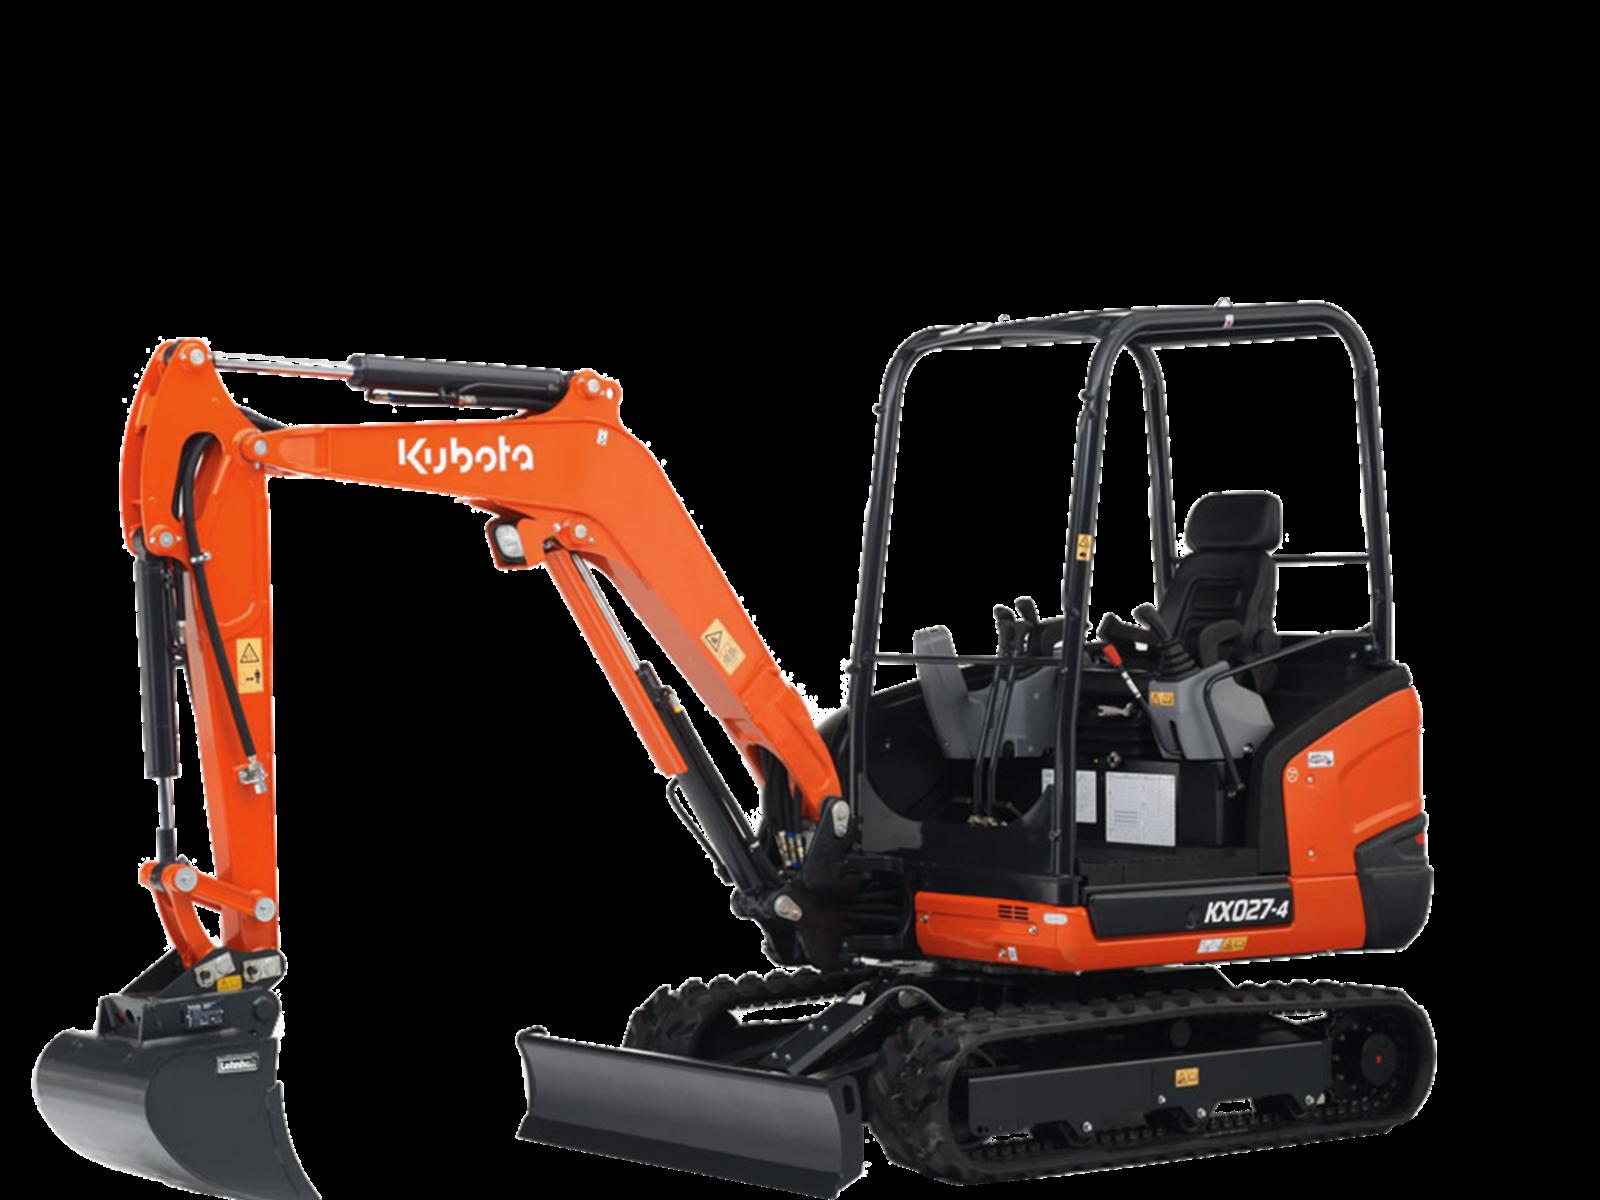 Mini-Excavators Kubota KX027-4 - Kubota